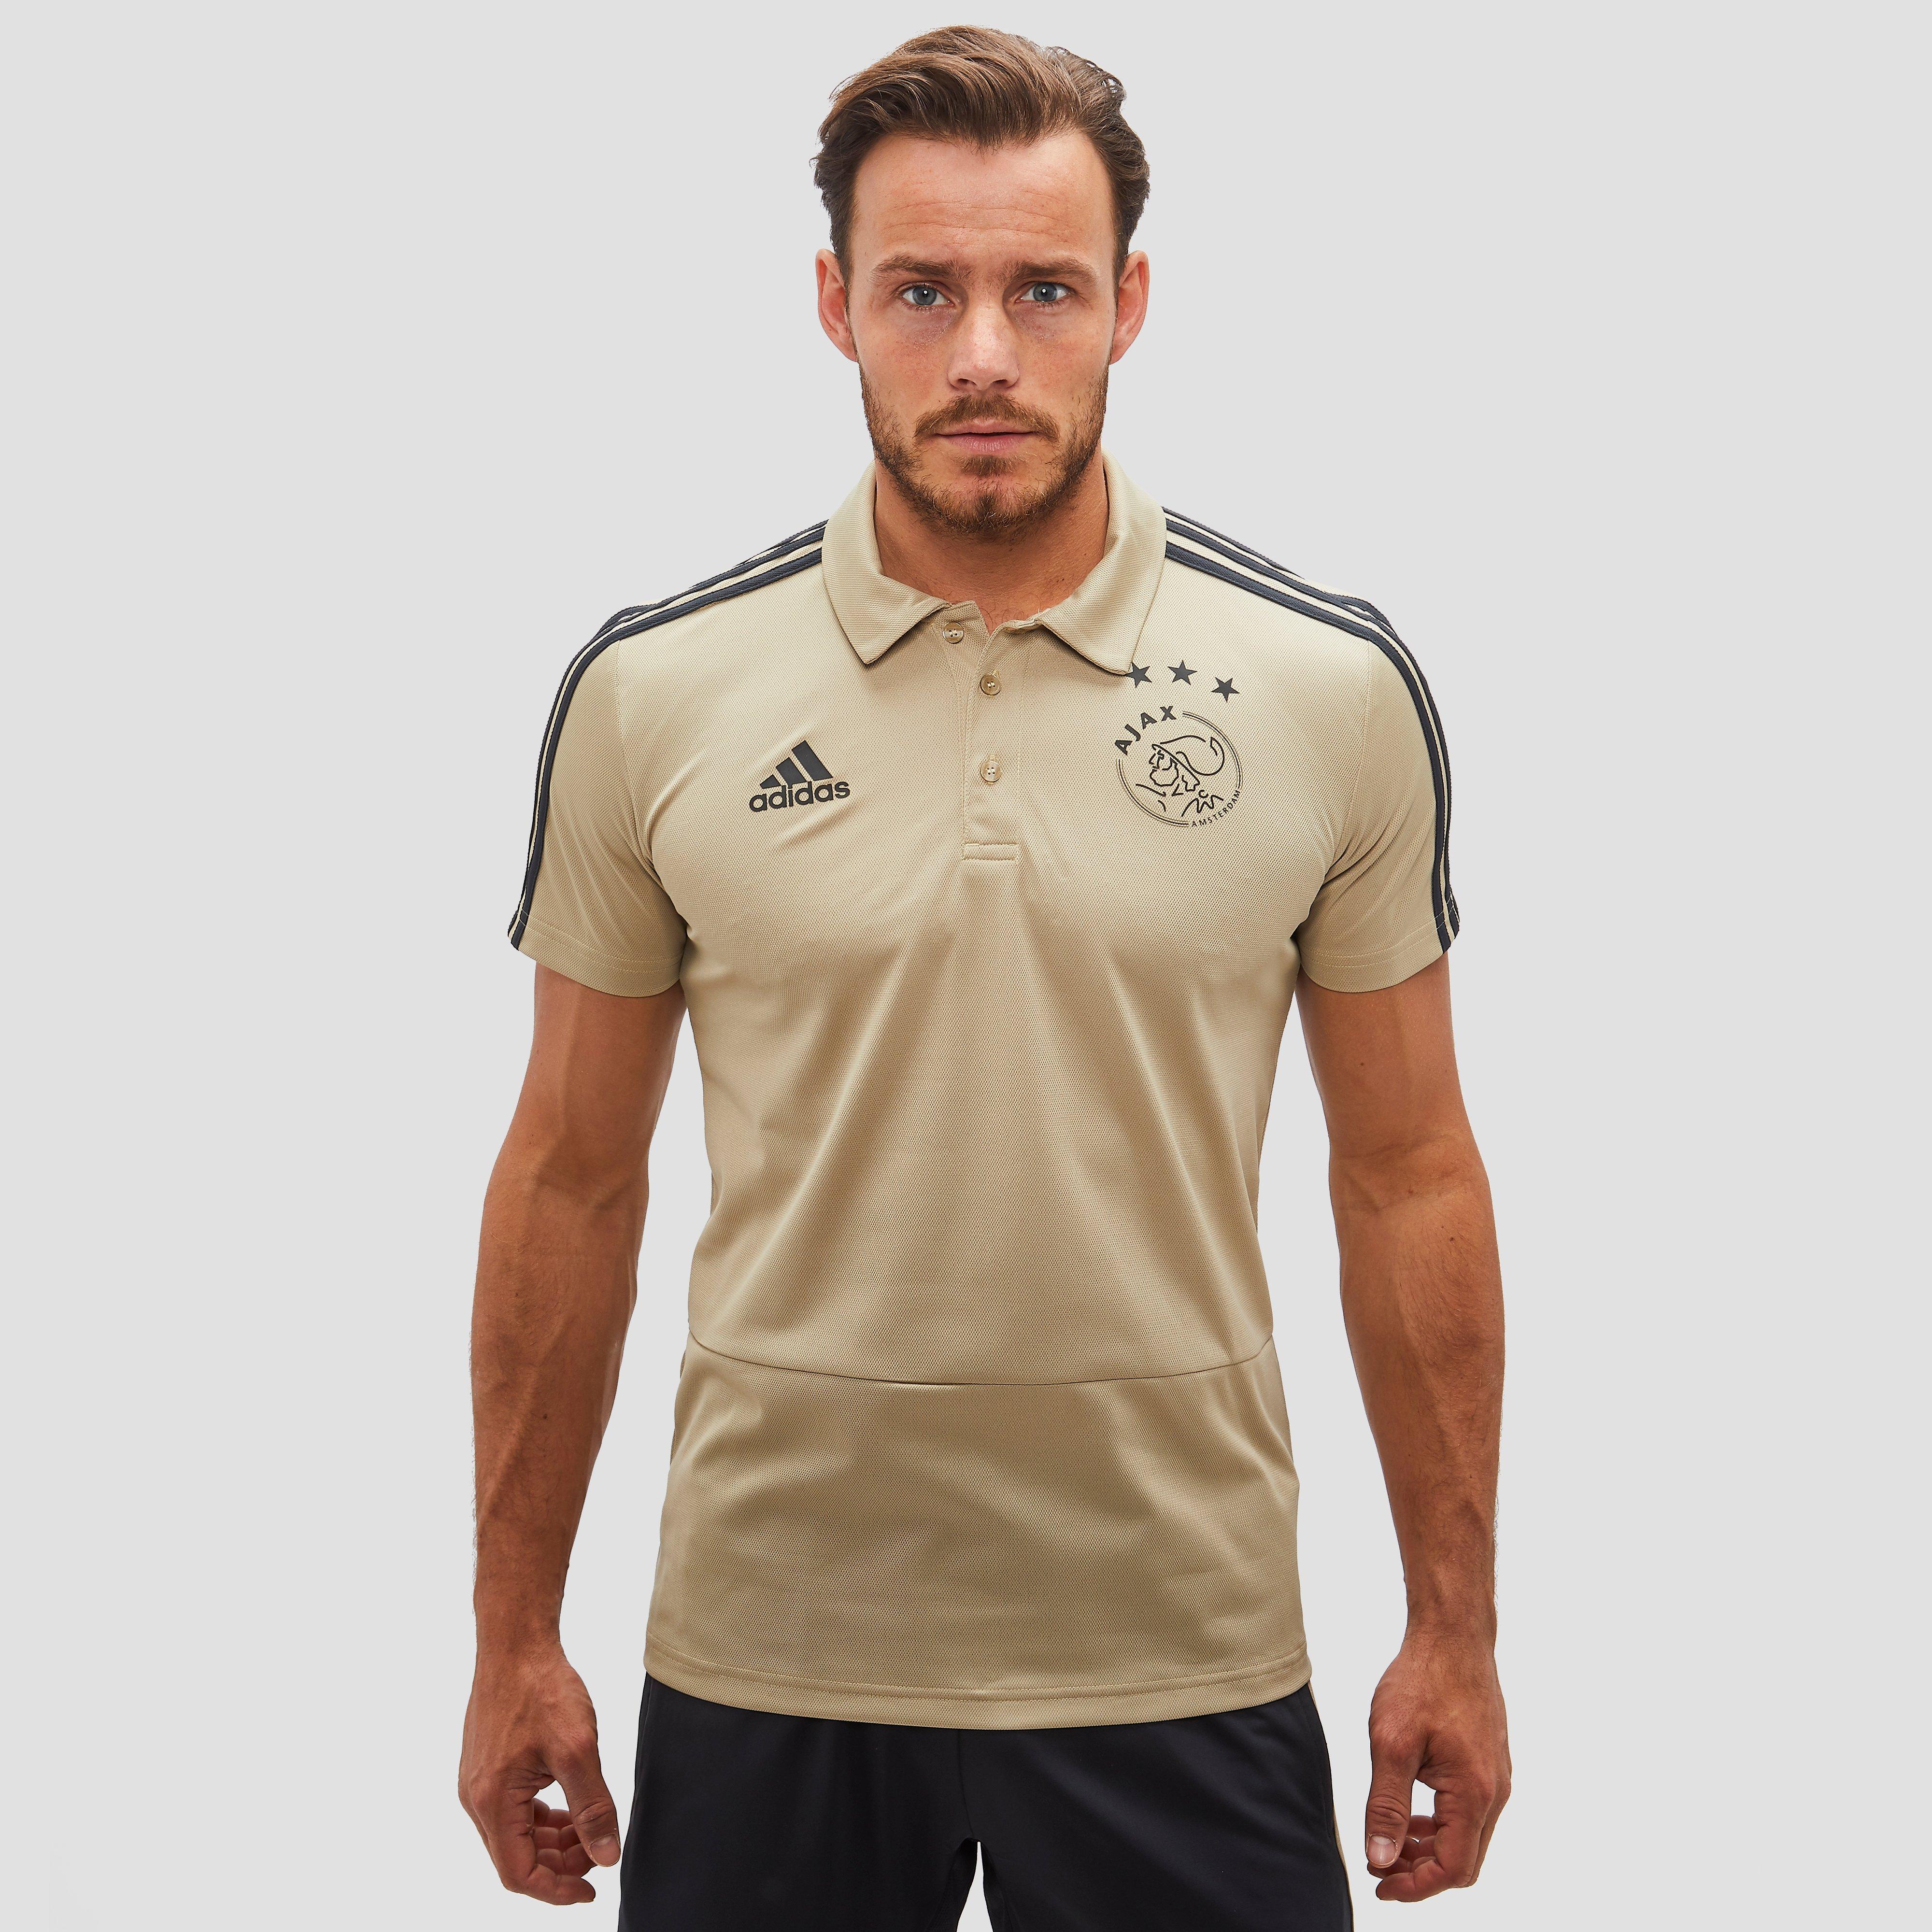 Adidas Chelsea Polo Shirt Mens - BCD Tofu House 95f5360f9